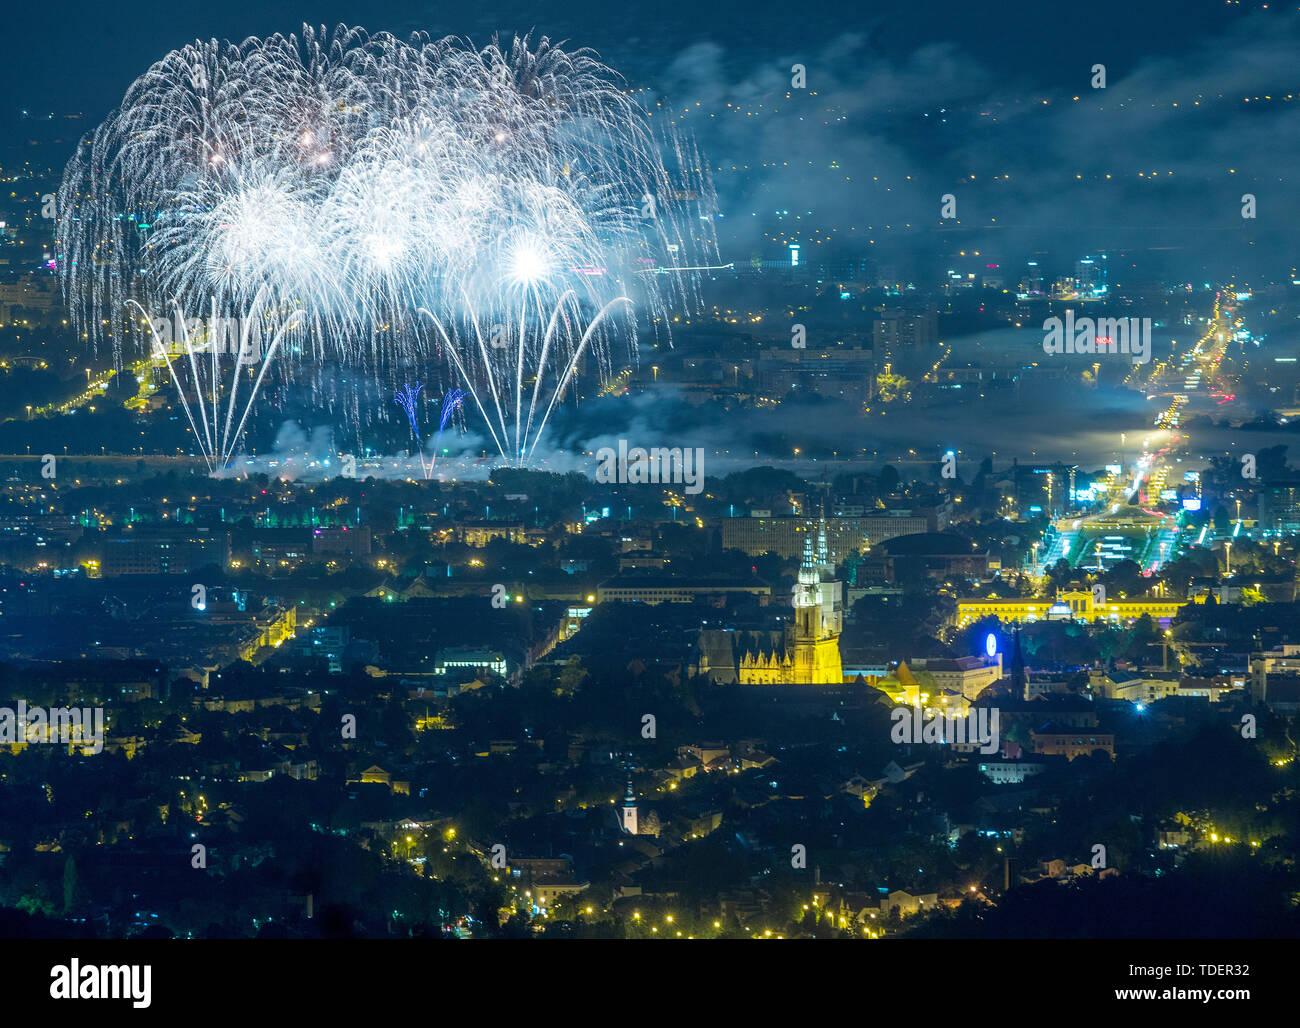 Zagreb. 14th June, 2019. Photo taken on June 14, 2019 shows fireworks during the 19th International Festival of Fireworks in Zagreb, Croatia. Credit: Igor Kralj/Xinhua/Alamy Live News Stock Photo